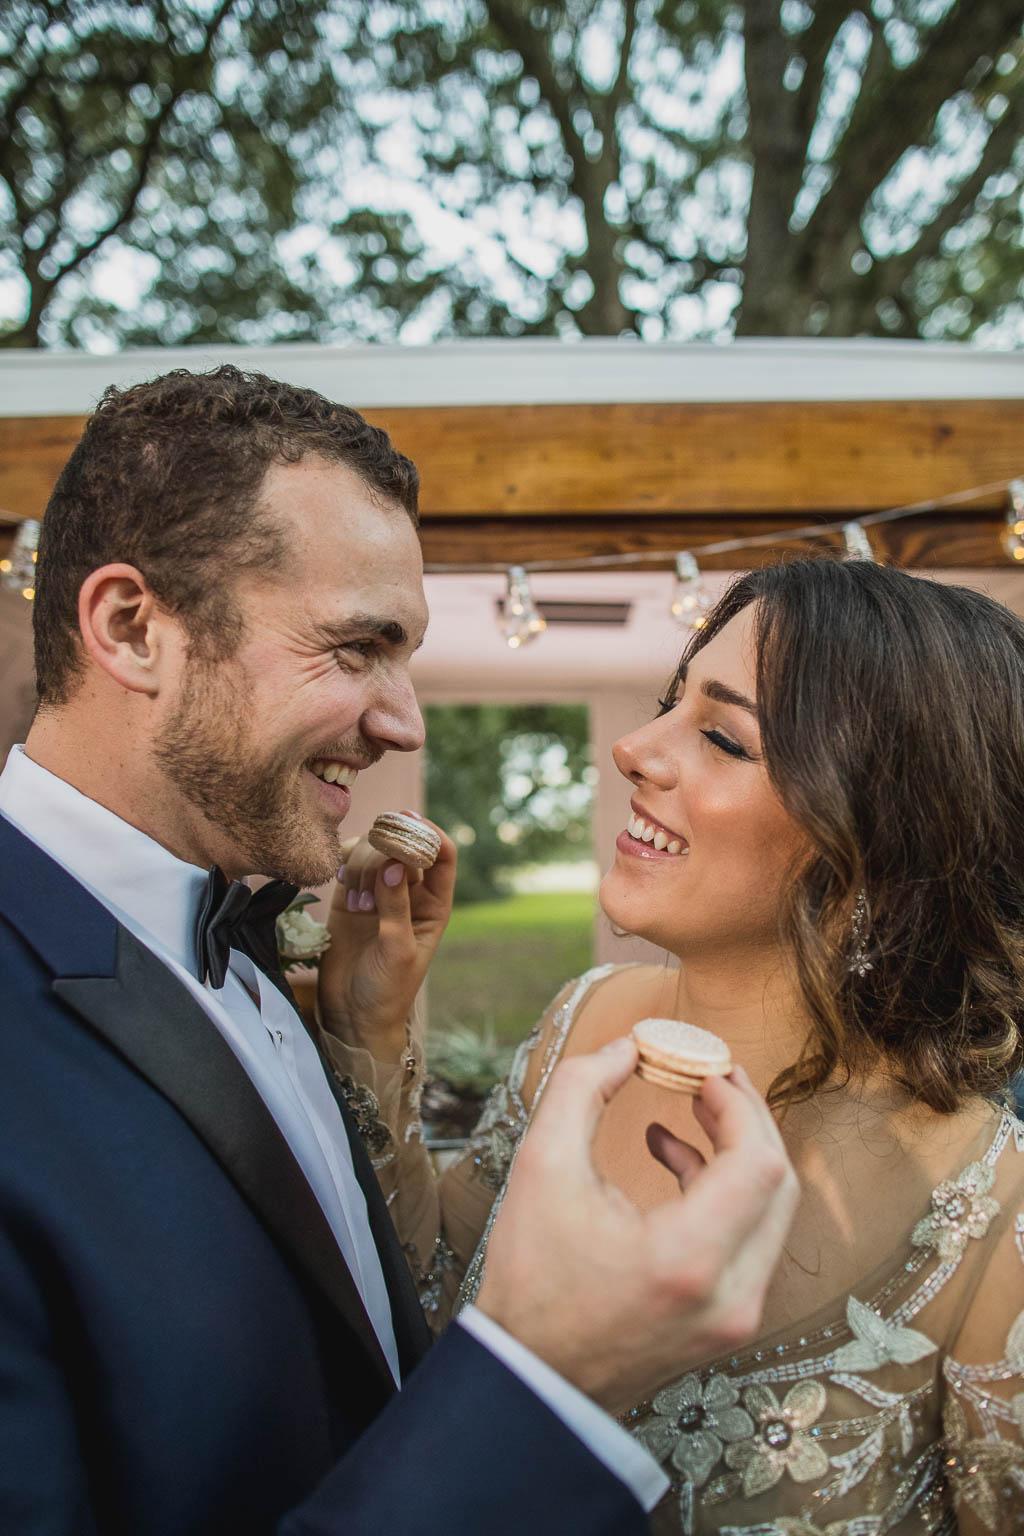 Wedding Photography New Orleans - Bride Film